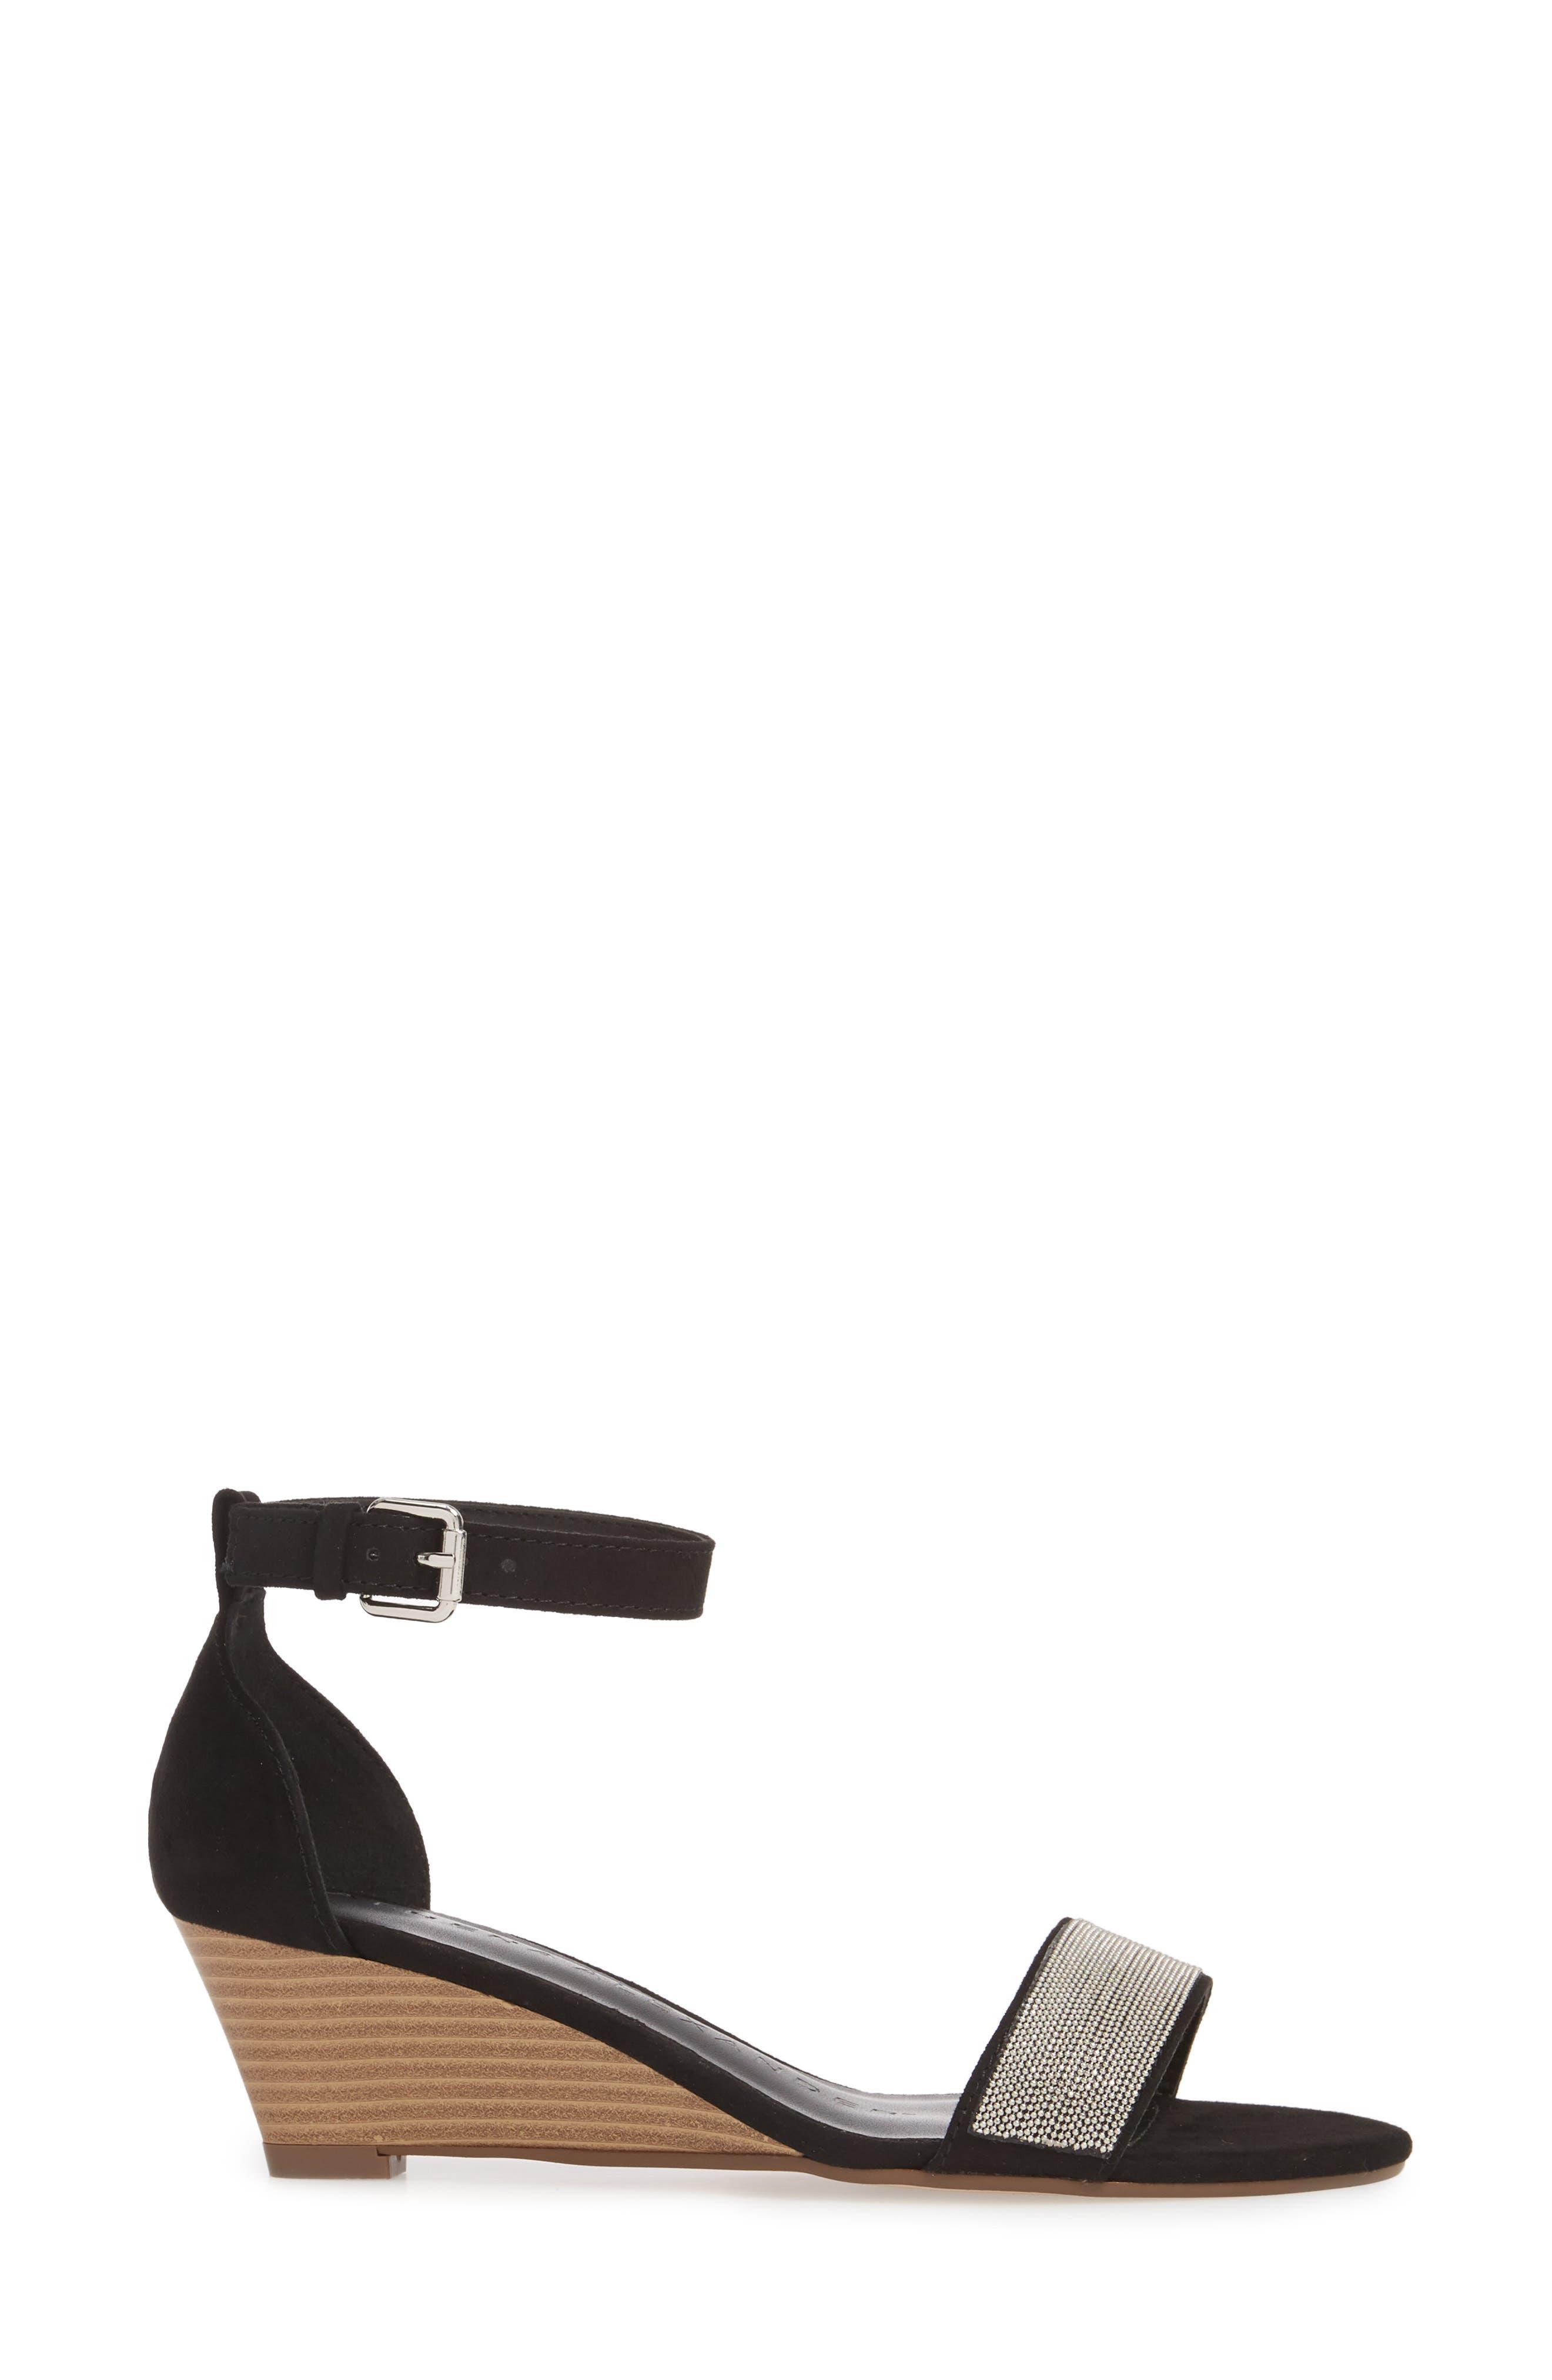 Enfield Ankle Strap Wedge Sandal,                             Alternate thumbnail 3, color,                             003